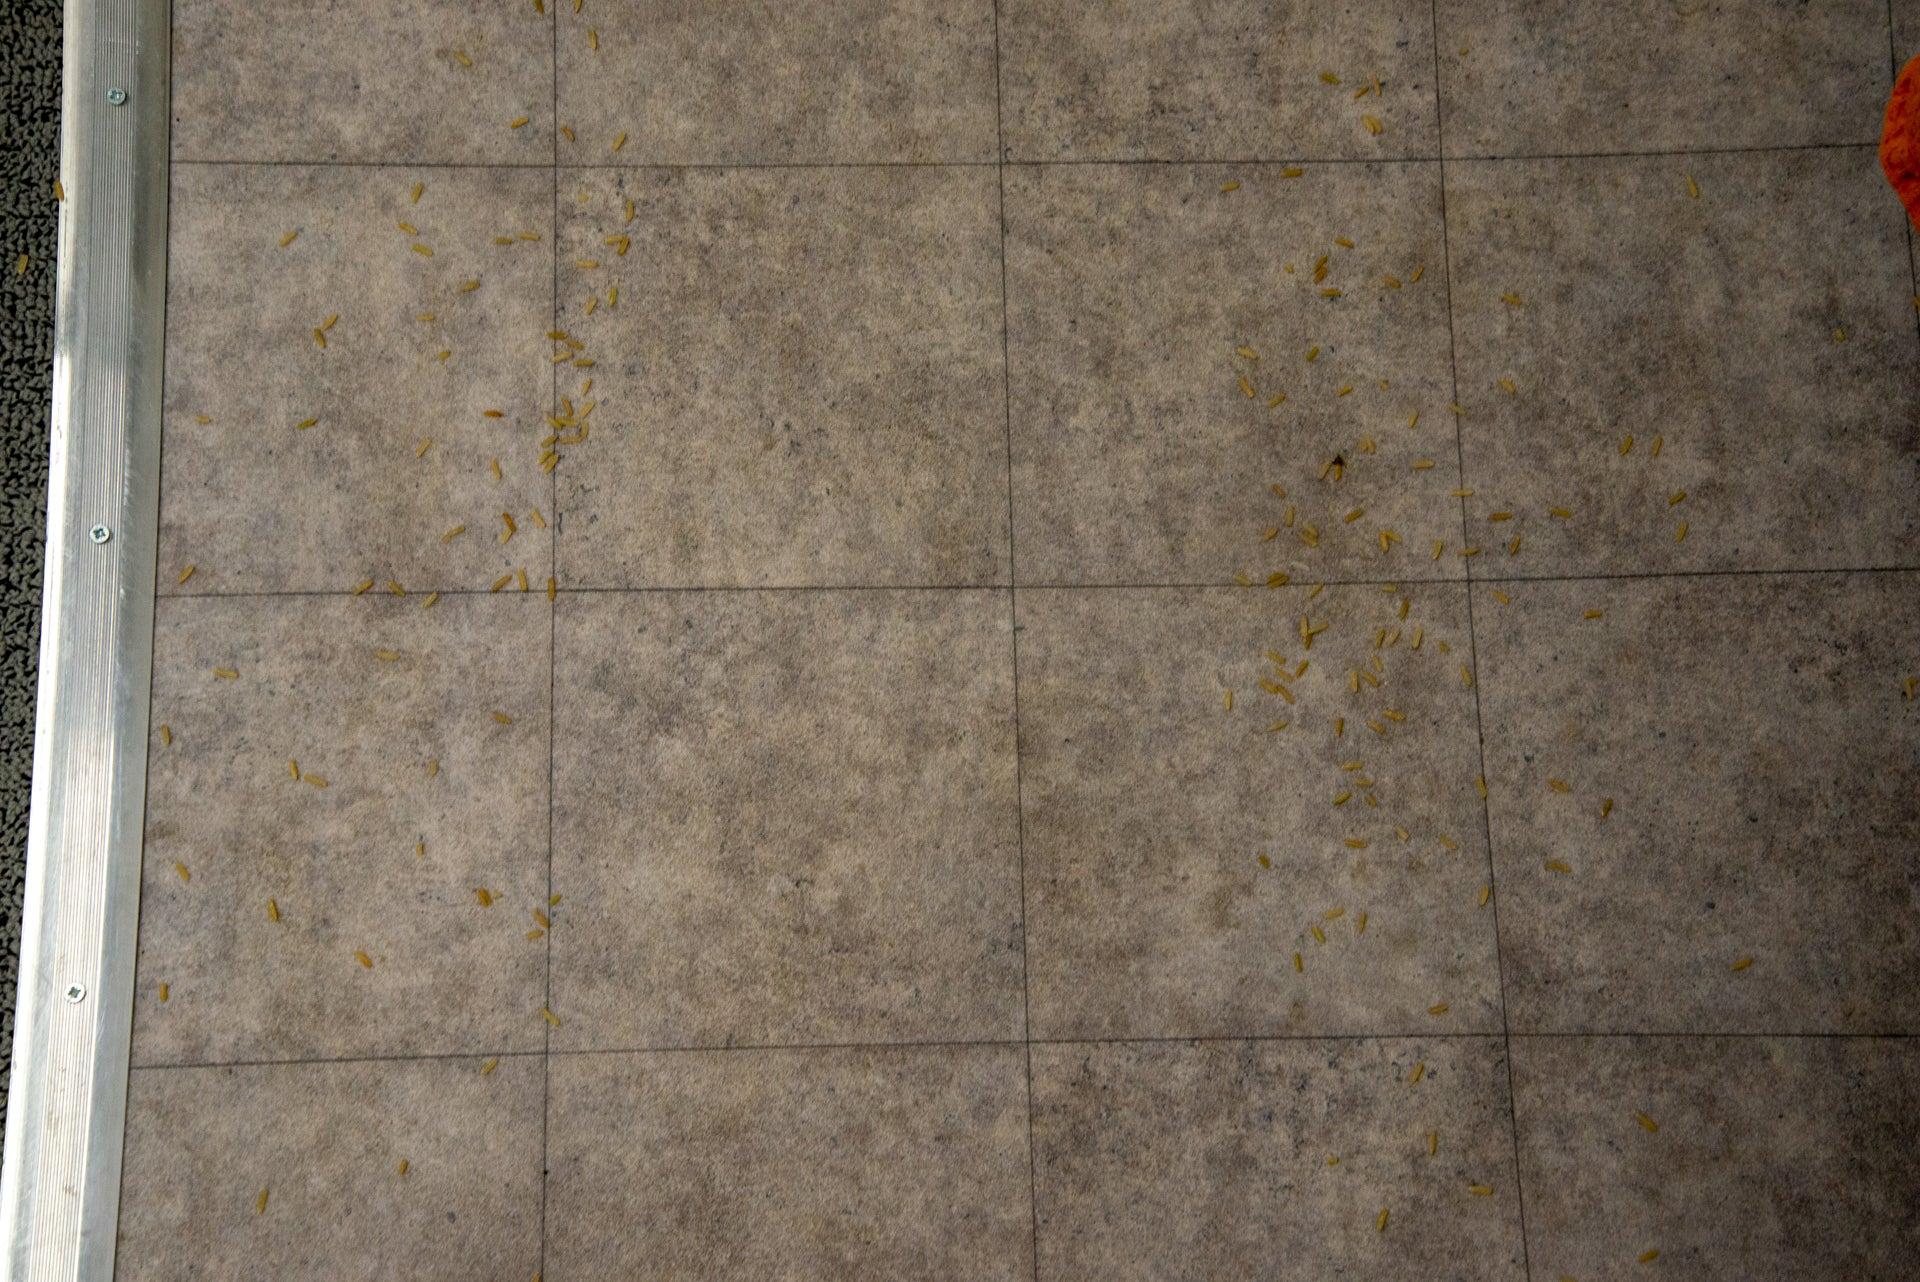 Ultenic U11 clean hard floor